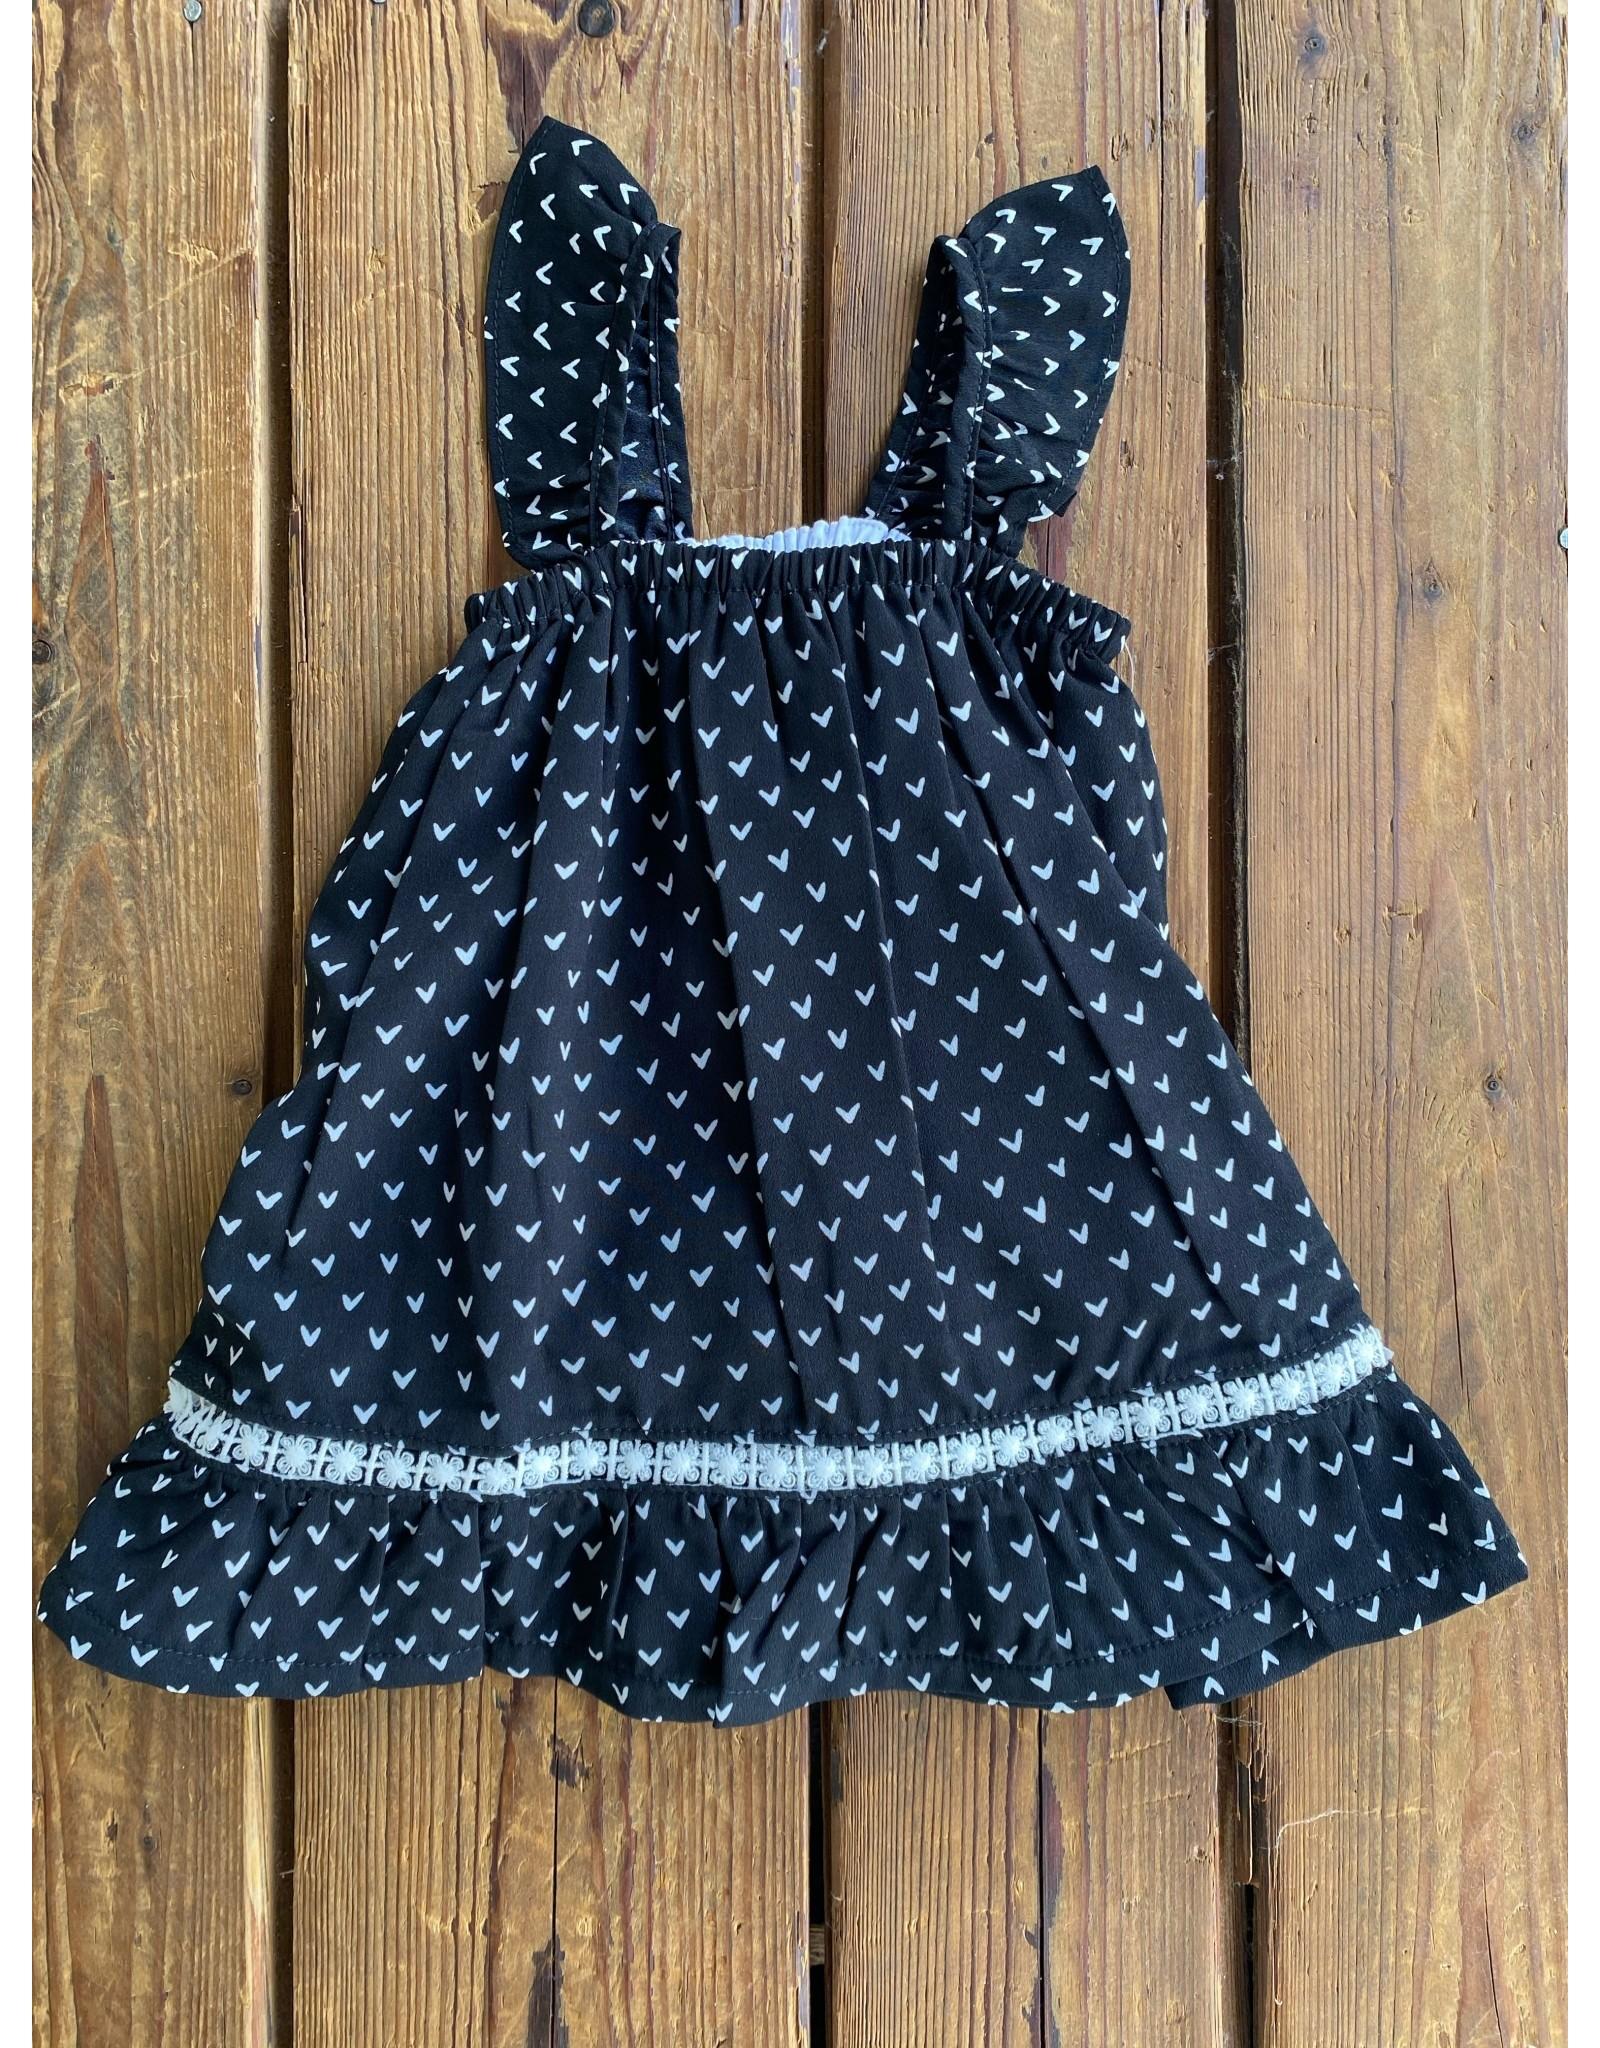 Kapital K- Heart Print Ruffle Dress